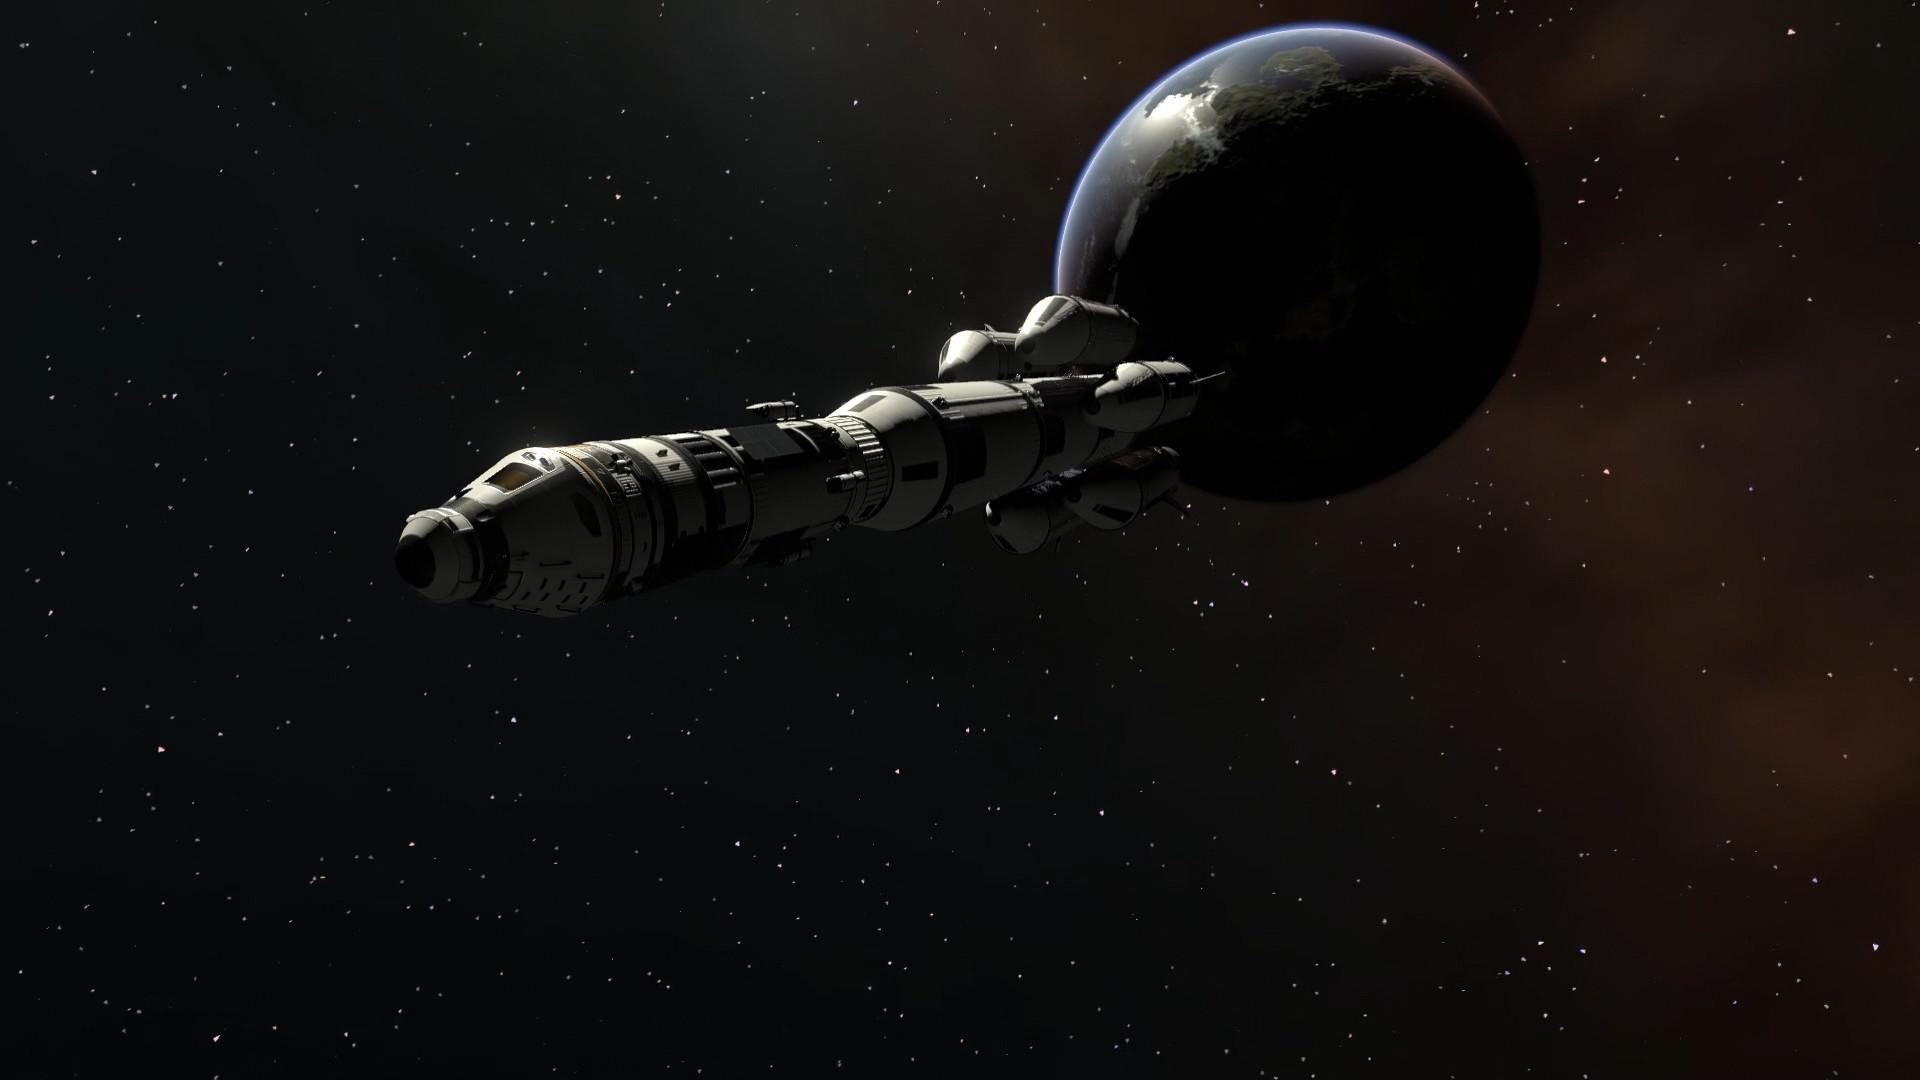 [Jeux] Kerbal Space Program 2 (2020) Ss_b4bd25ccc6b625bd22a6c7c8ae0244d66048e0d5.1920x1080